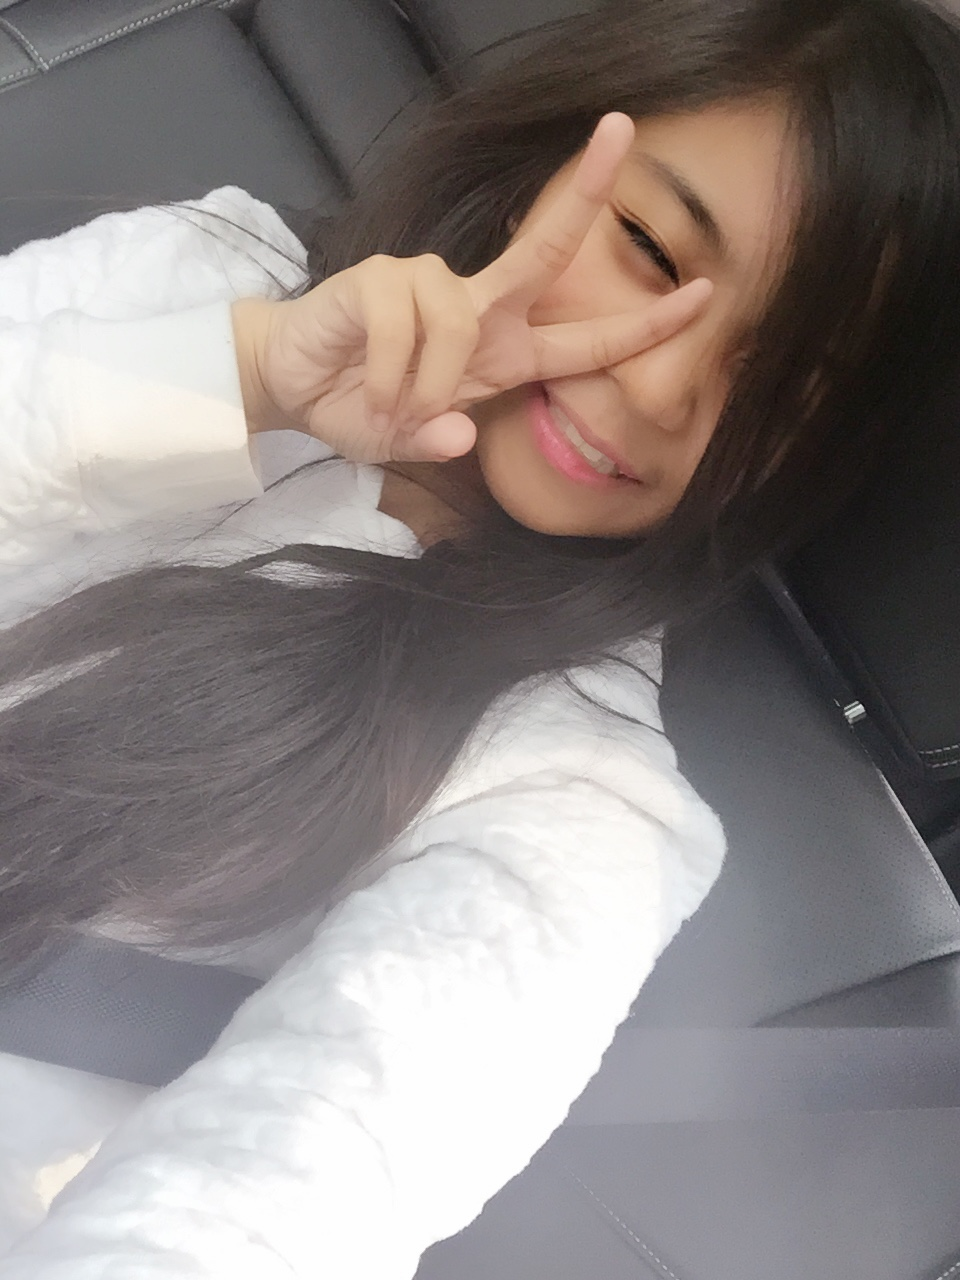 Just random selcas in the car haha